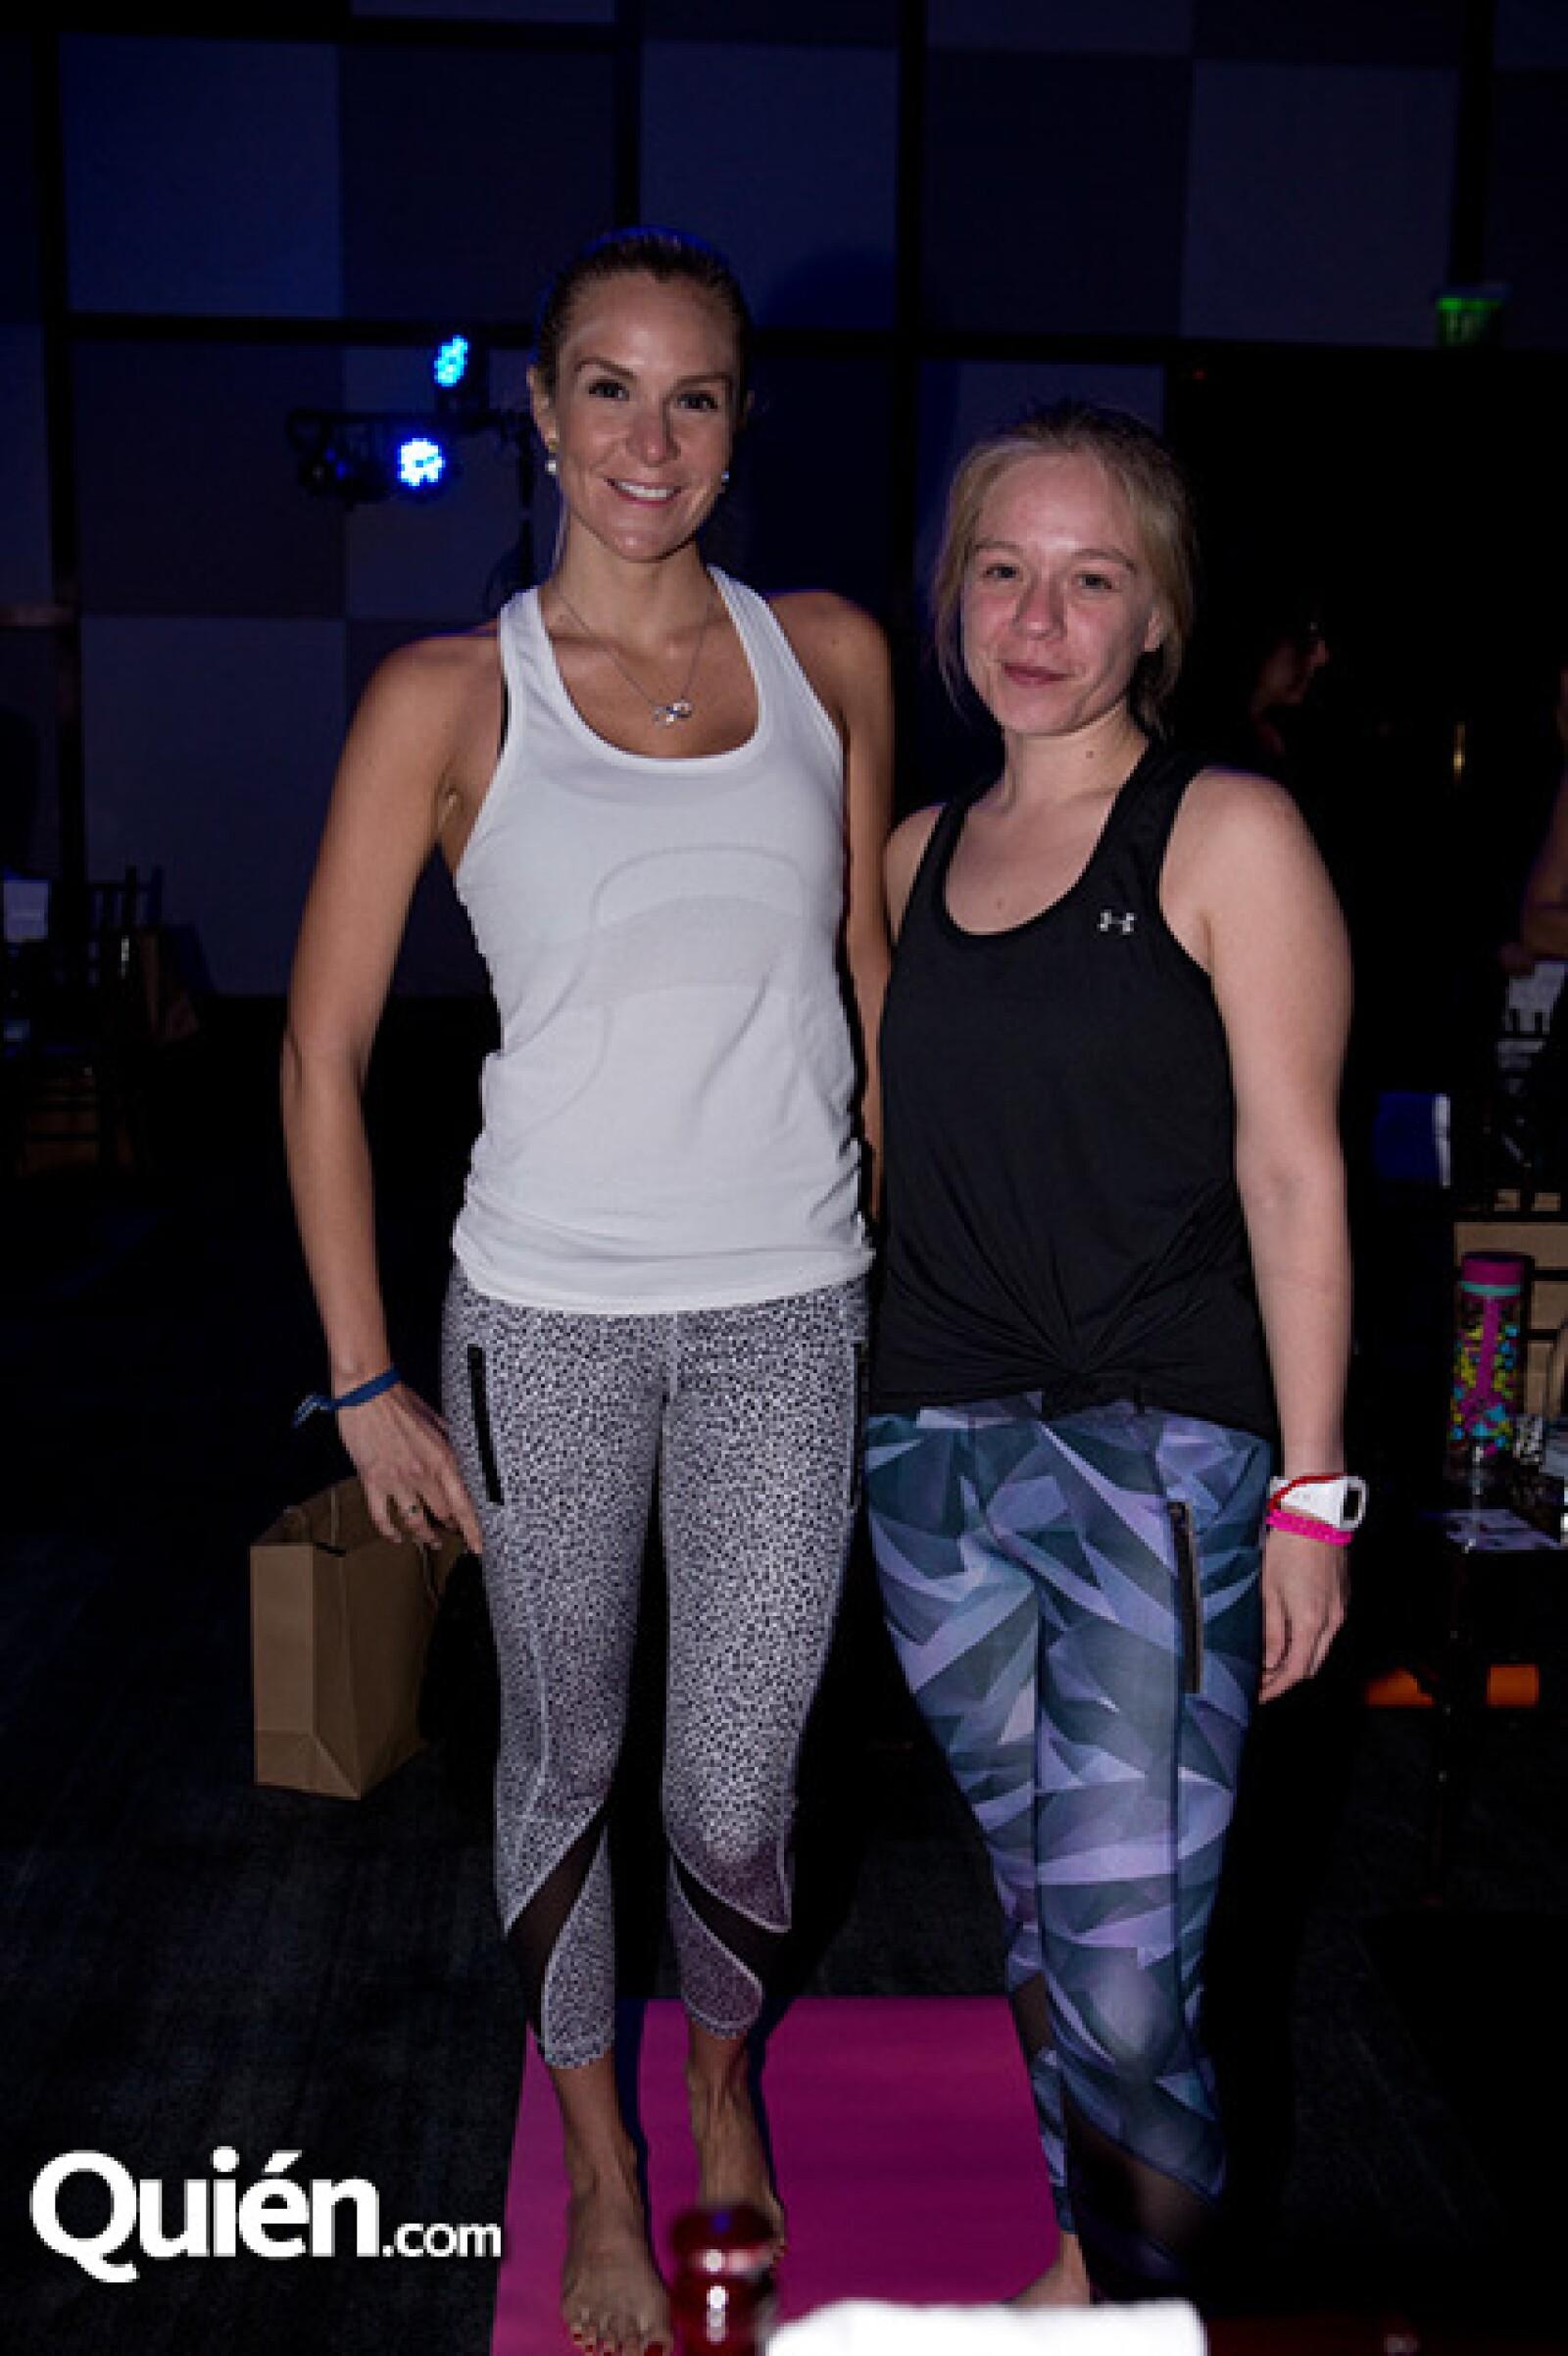 Vanessa Álvarez y Angie Mora